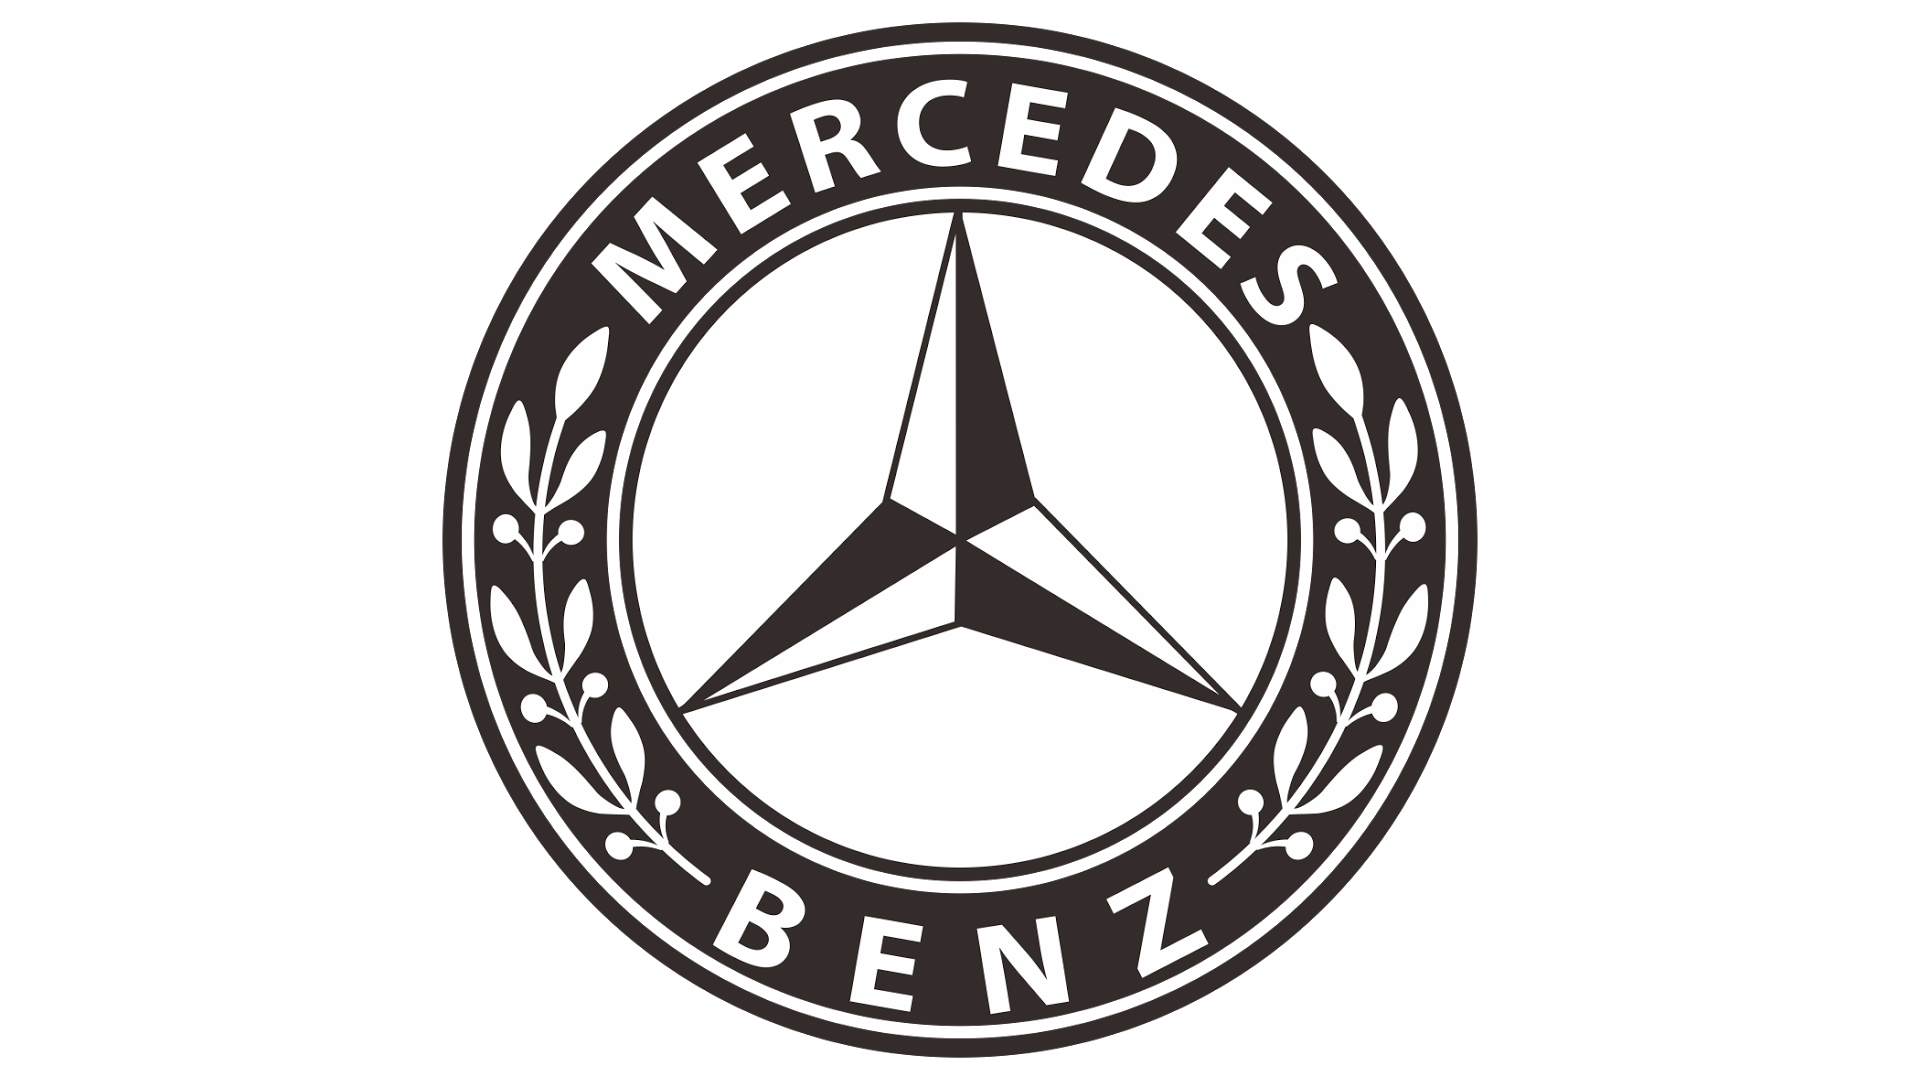 Mercedes Logo Mercedes Benz Logo Meaning Information